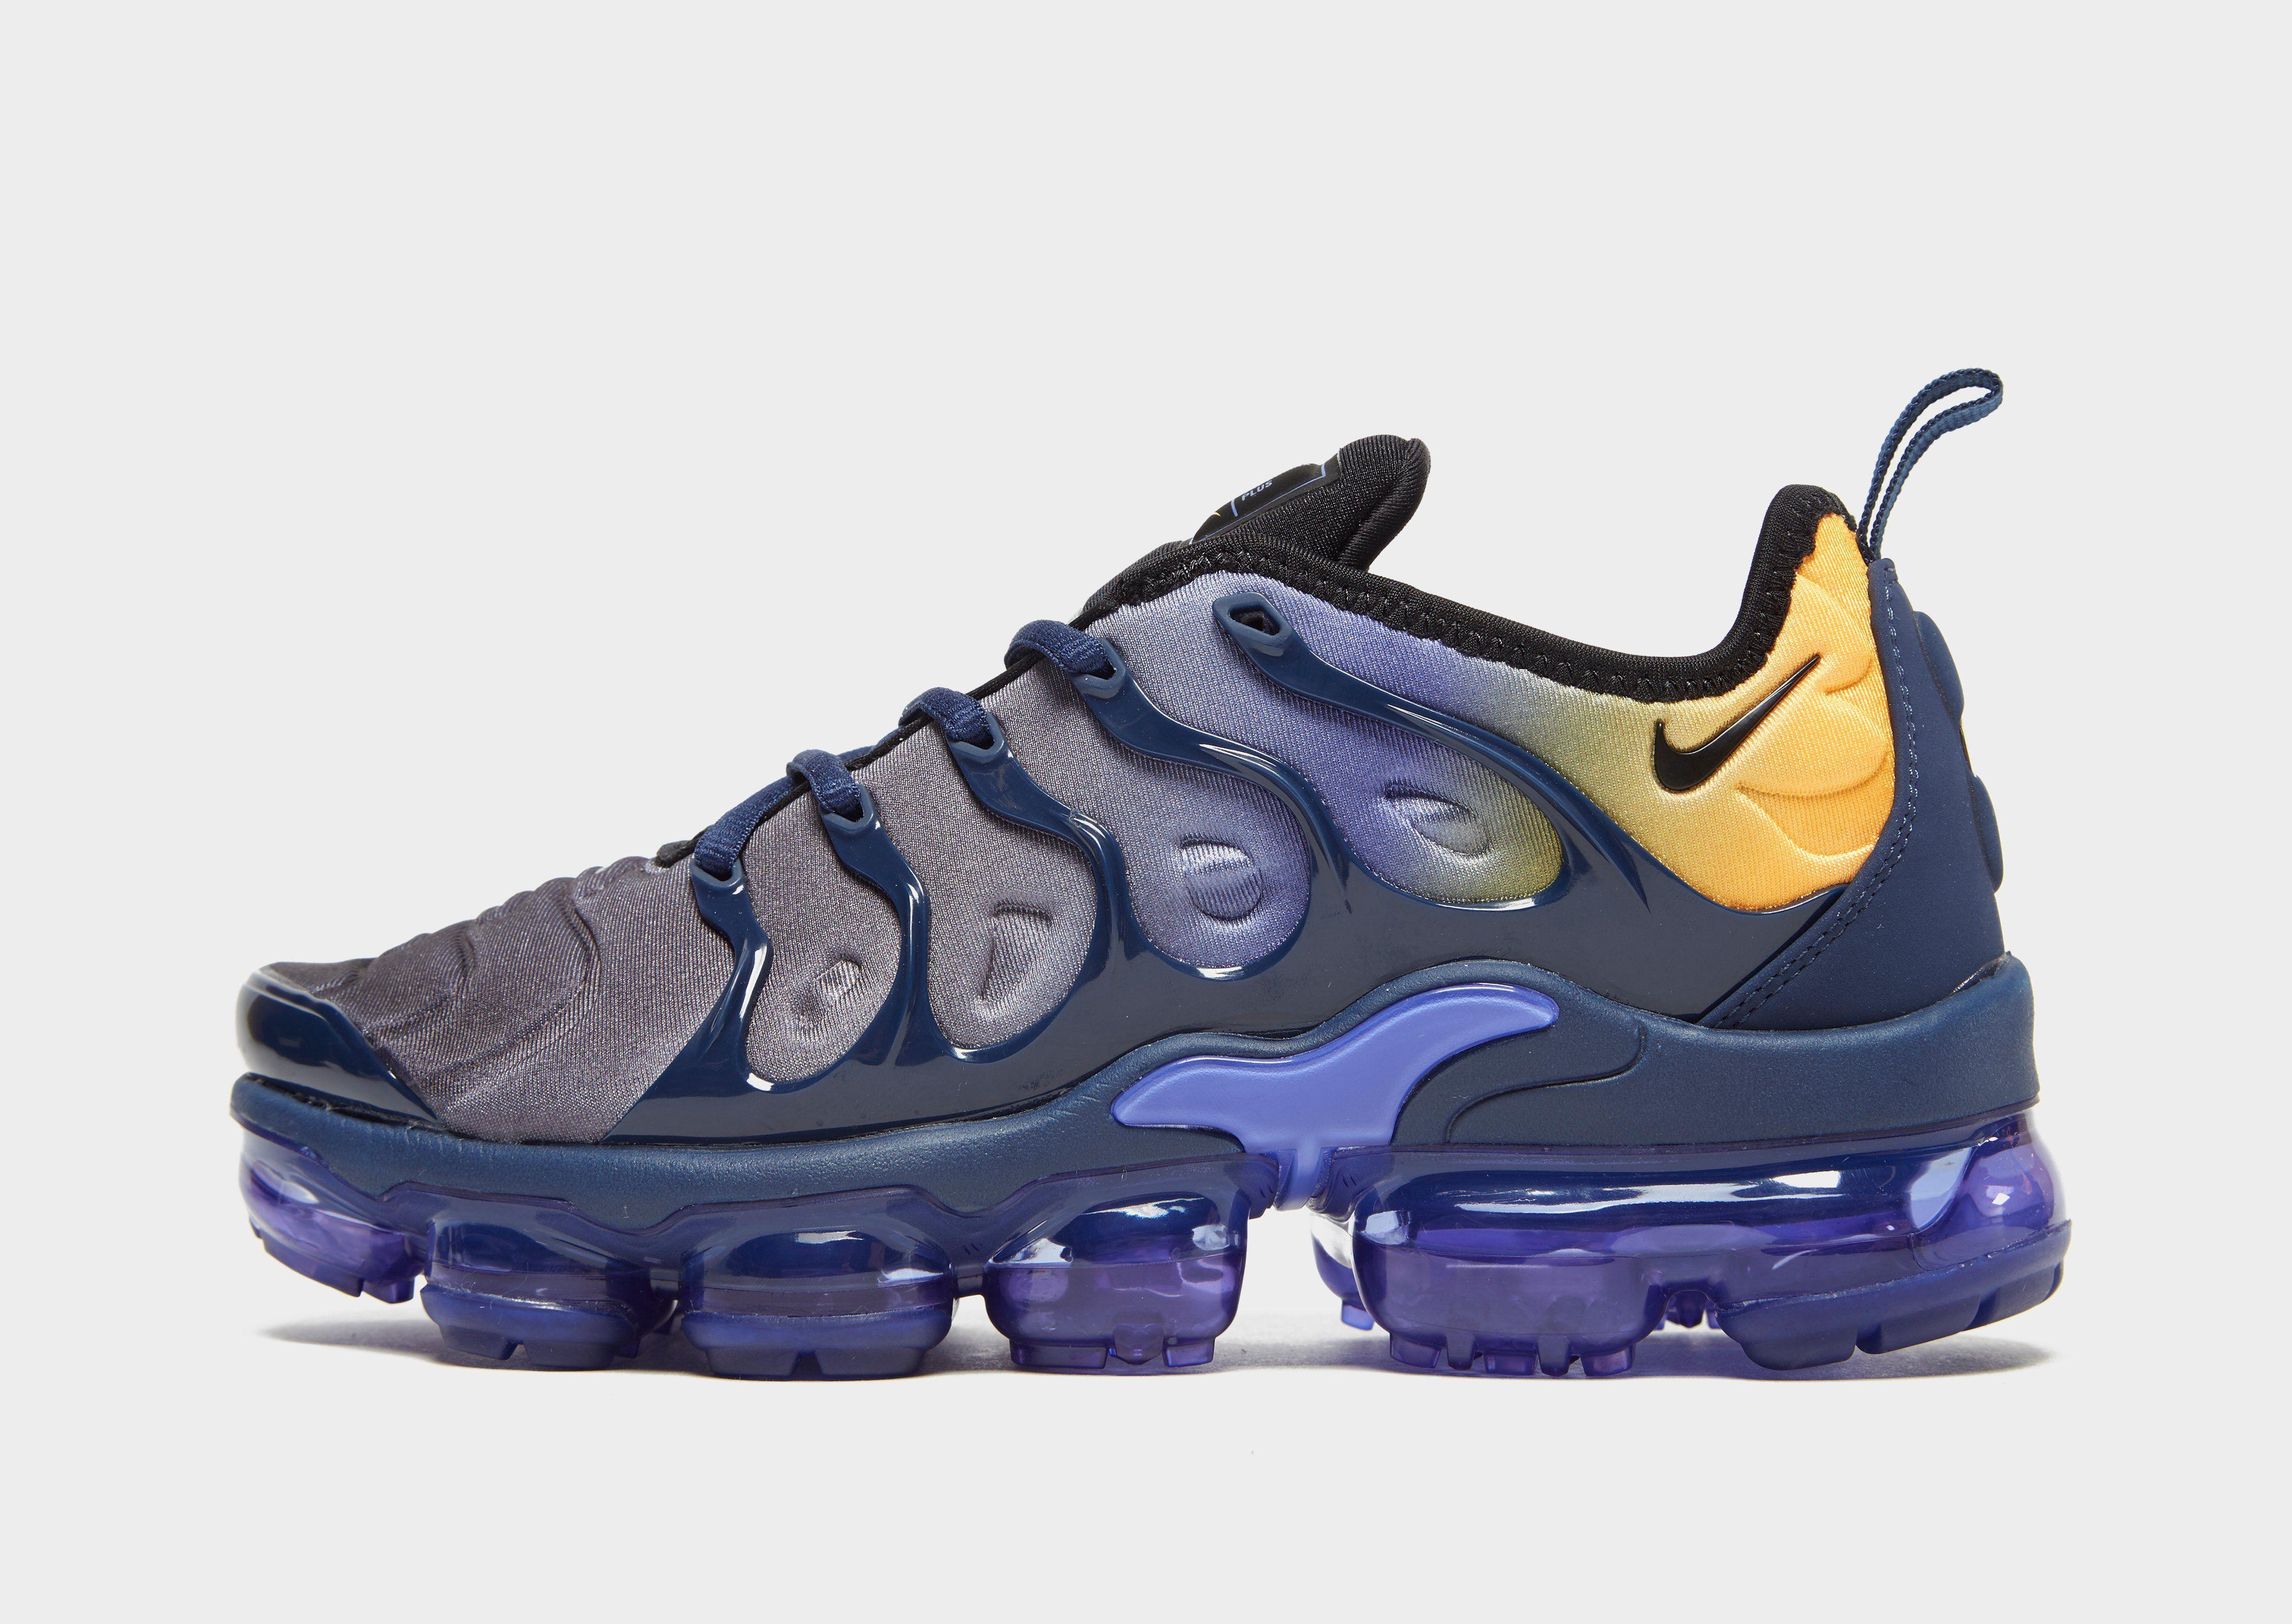 0240b93494a Nike Air VaporMax Plus Women s